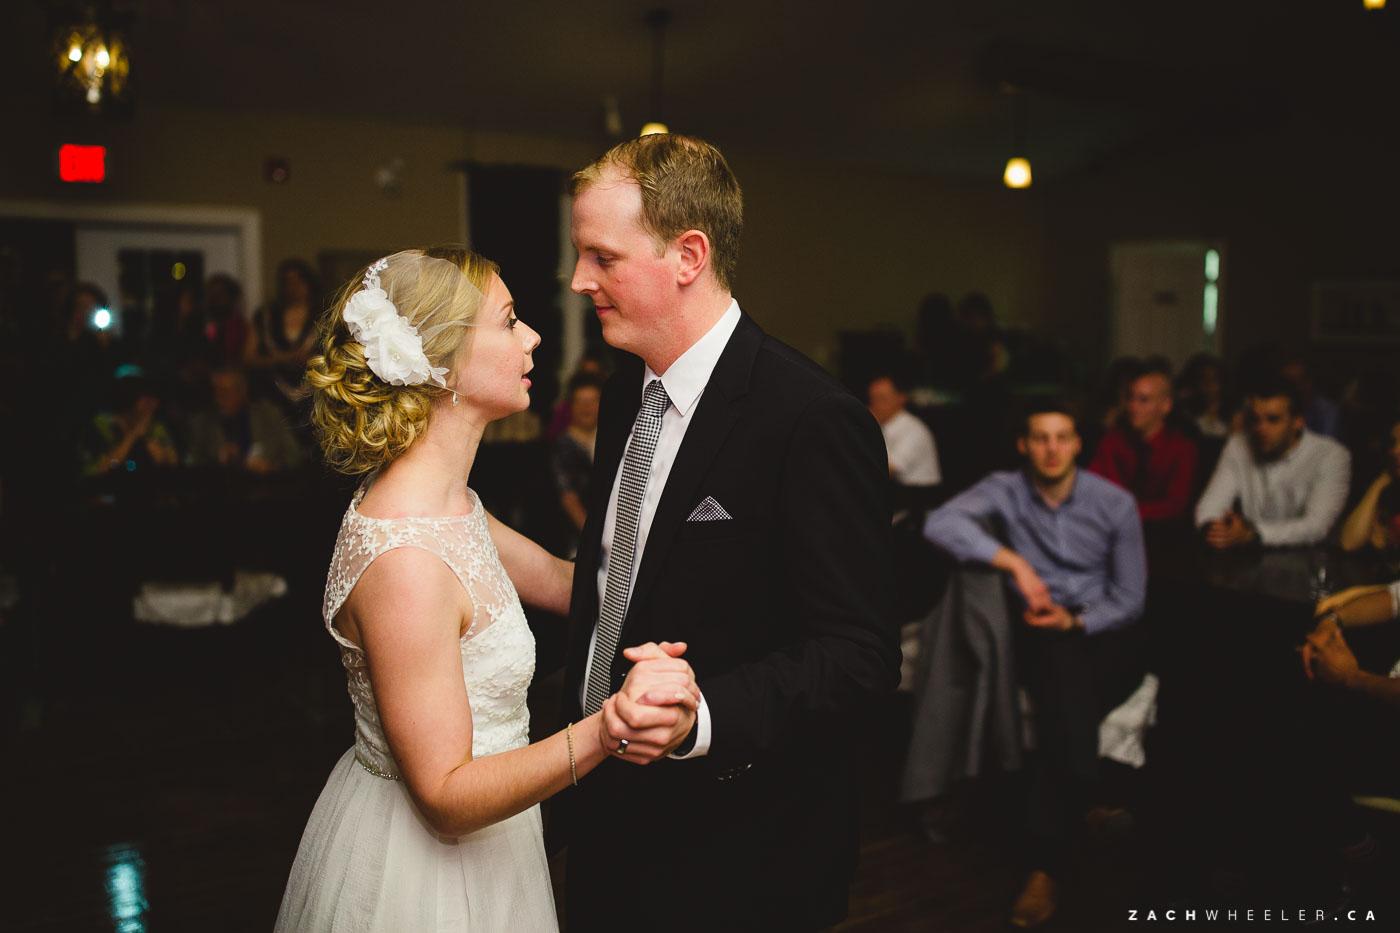 Sarah-Grant-Lesters-Fram-Wedding-101